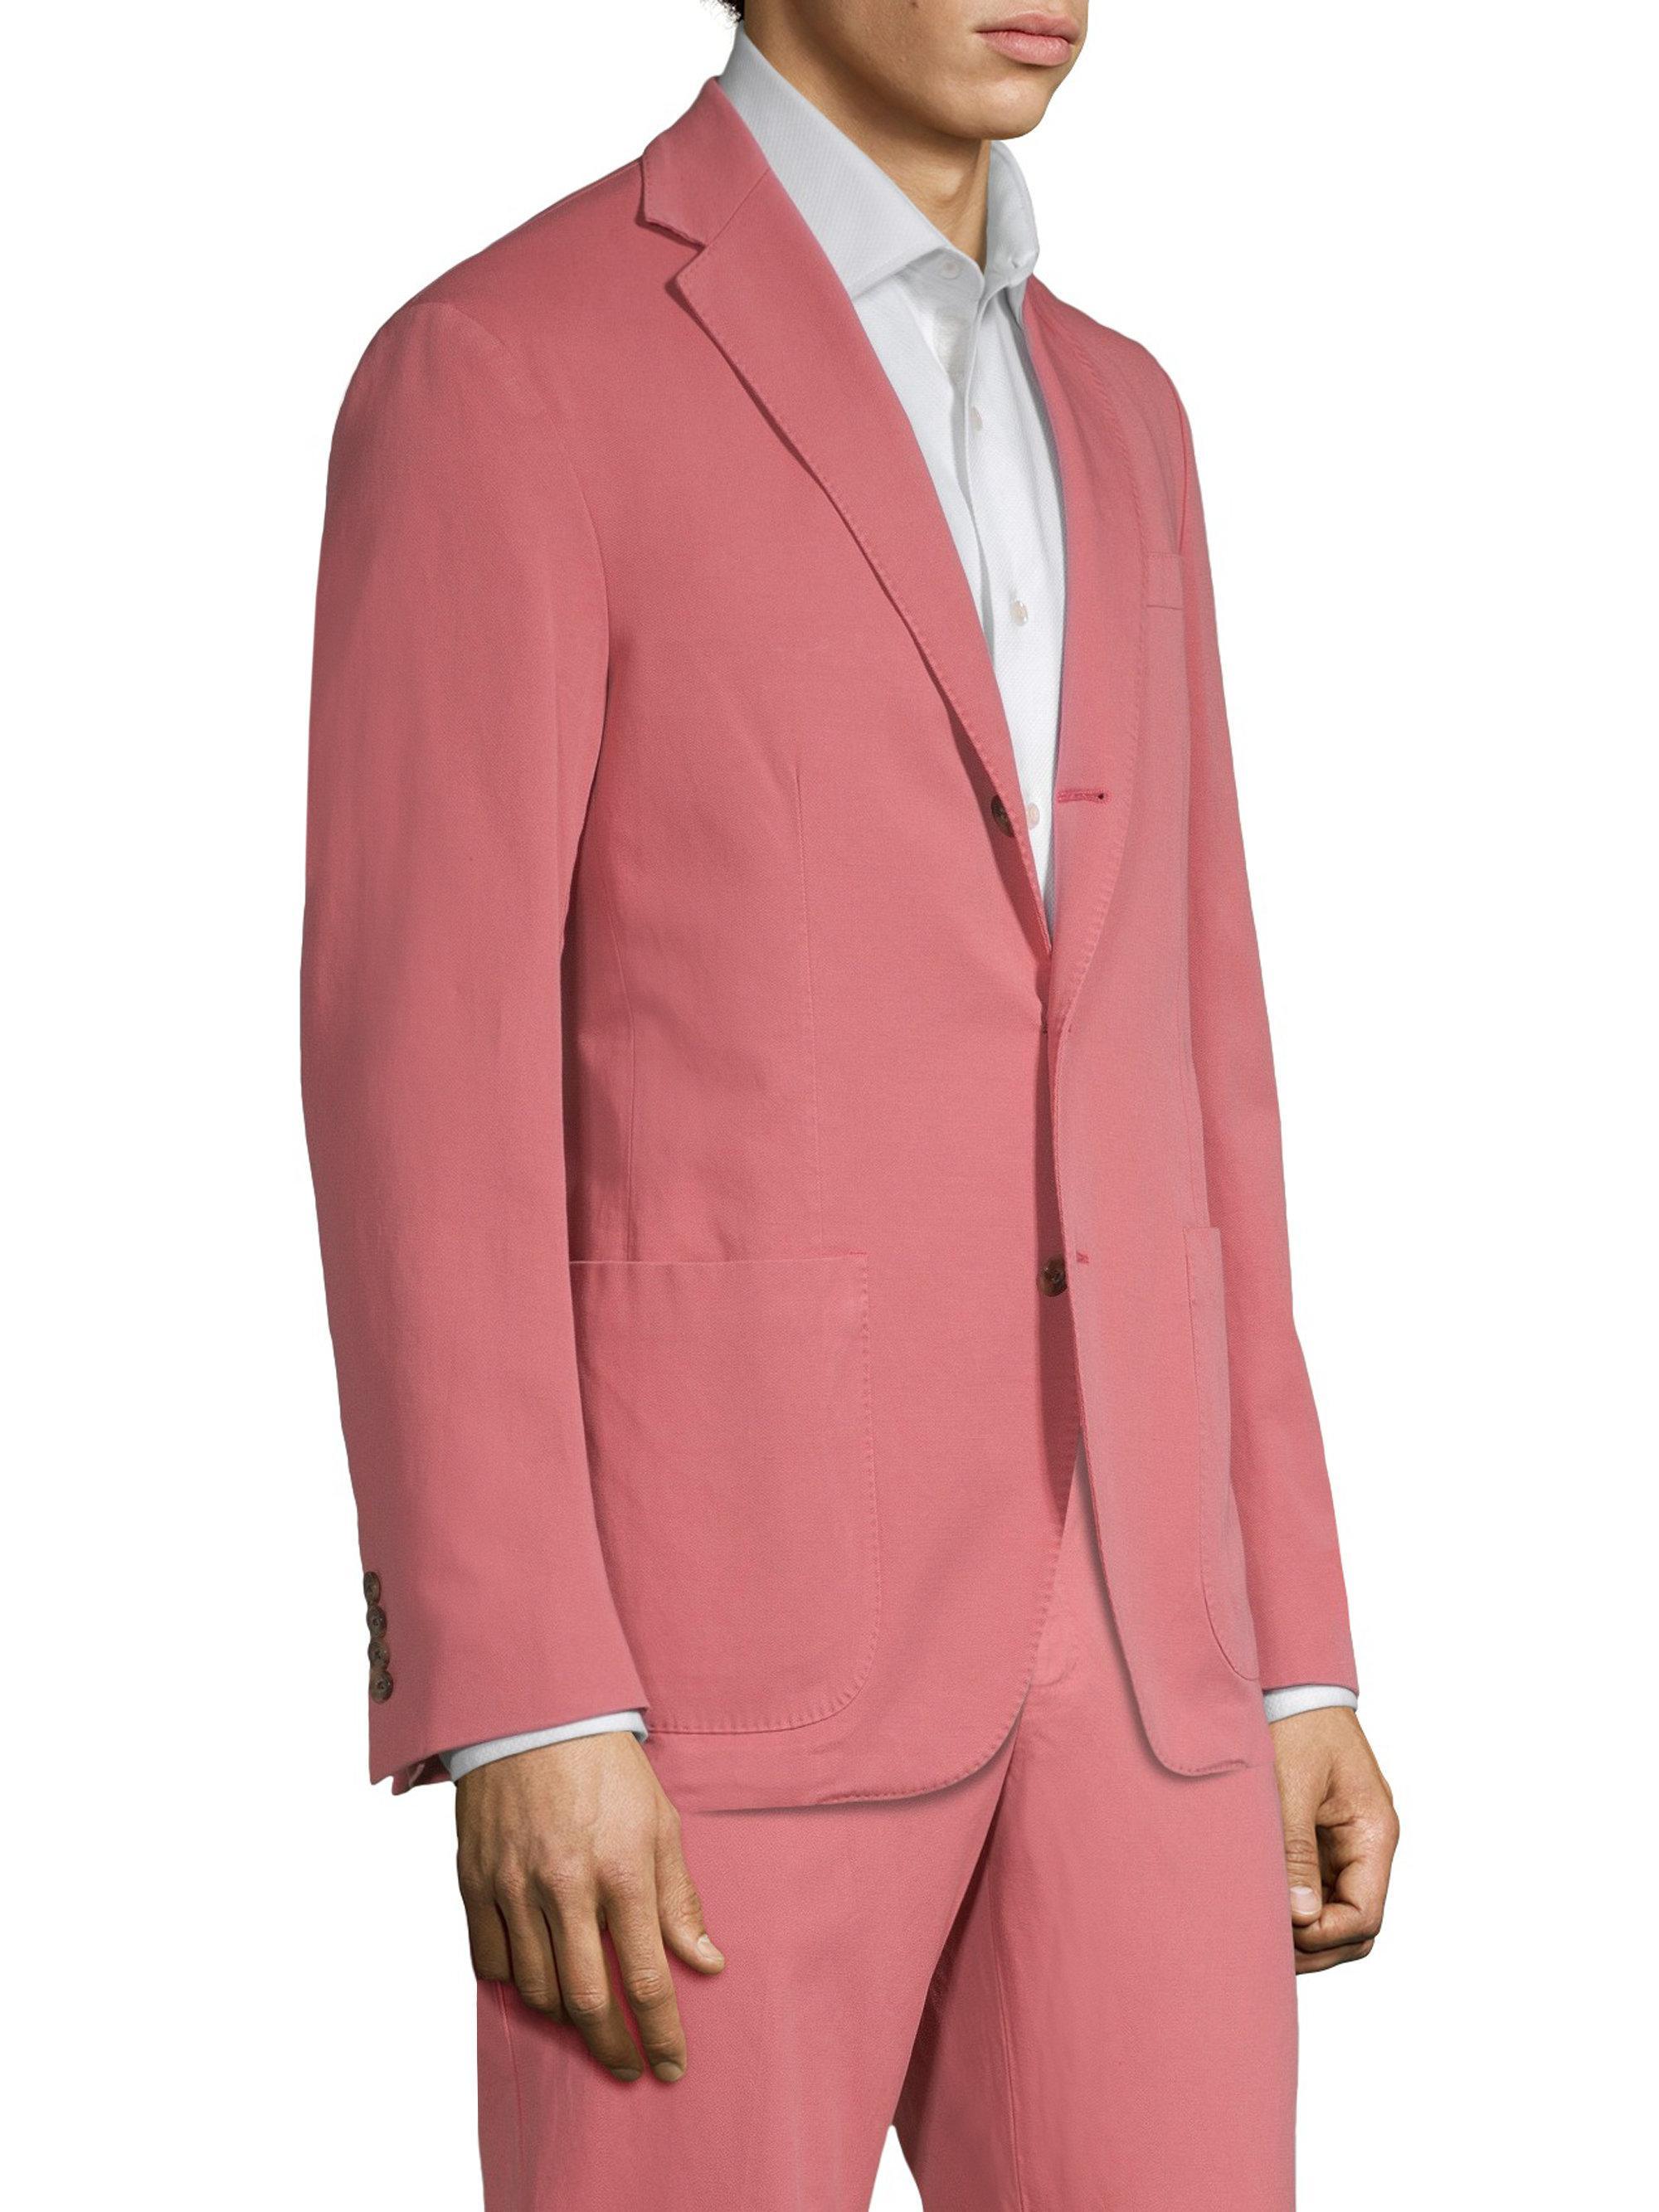 Men Red Fit Yale Blazer Ralph Polo Lyst Morgan For Slim Lauren In X8AqSv